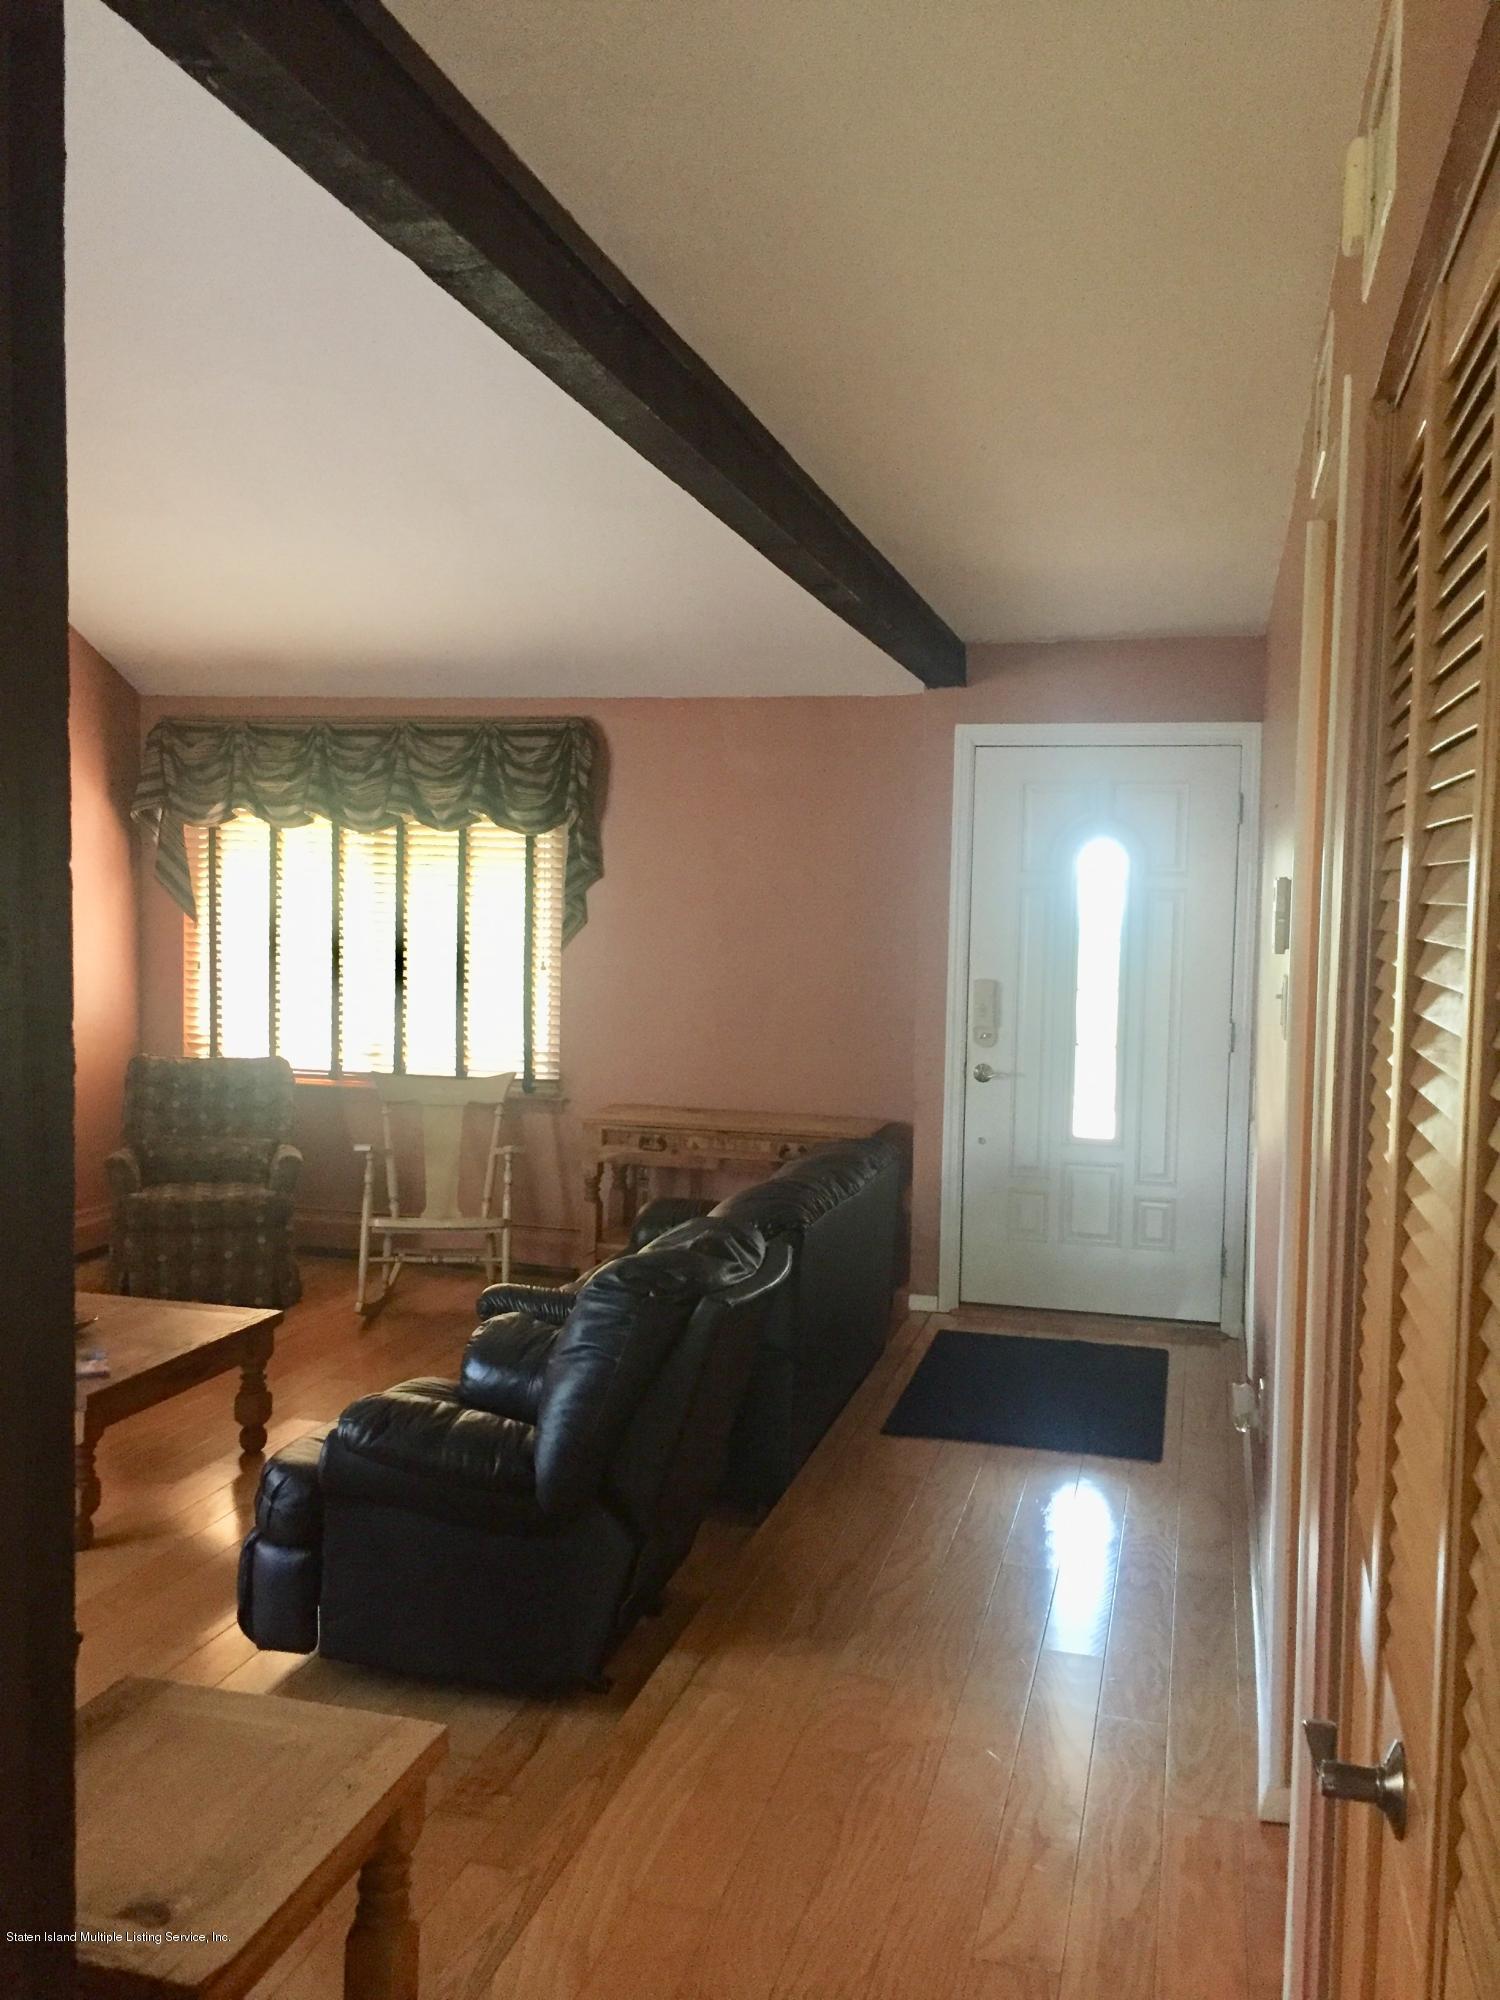 Single Family - Detached 46 Forrestal Avenue  Staten Island, NY 10312, MLS-1131922-7